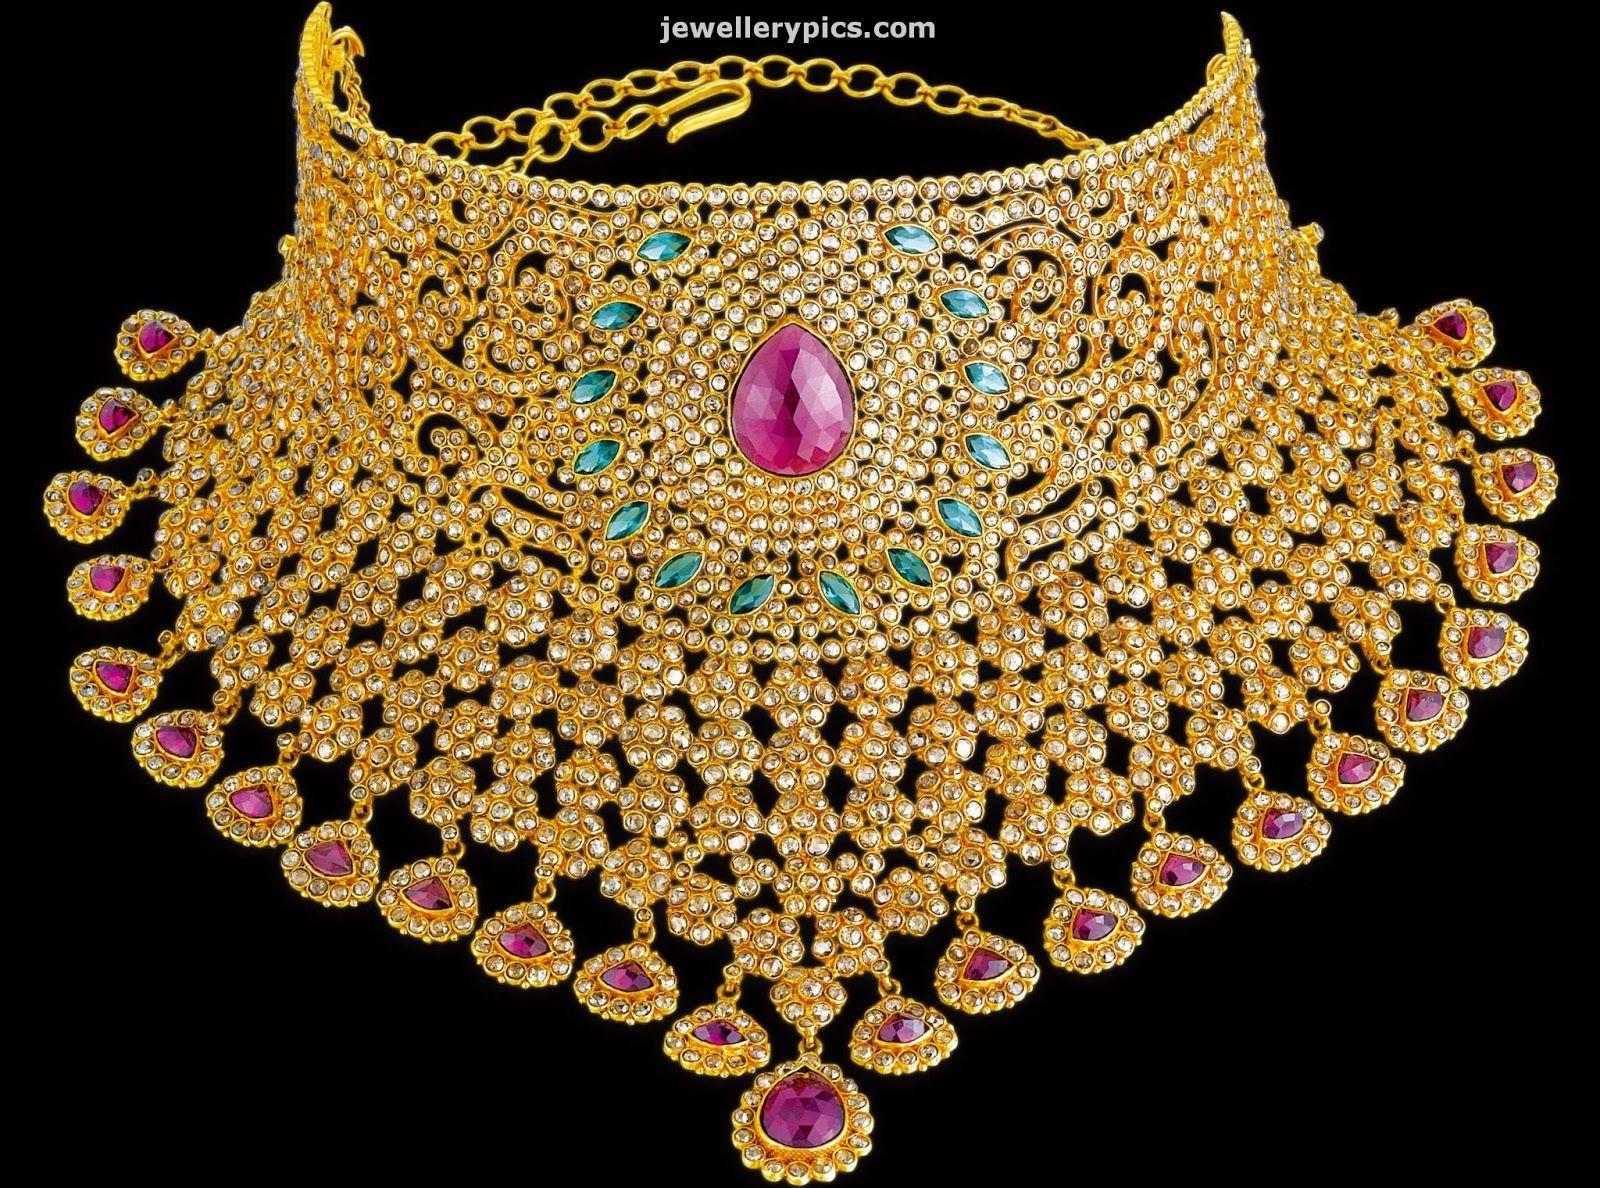 Malabar gold jewellery designs dubai - Latest Indian Gold And Diamond Jewellery Designs Heavy Bridal Uncut Diamond Choker Necklace